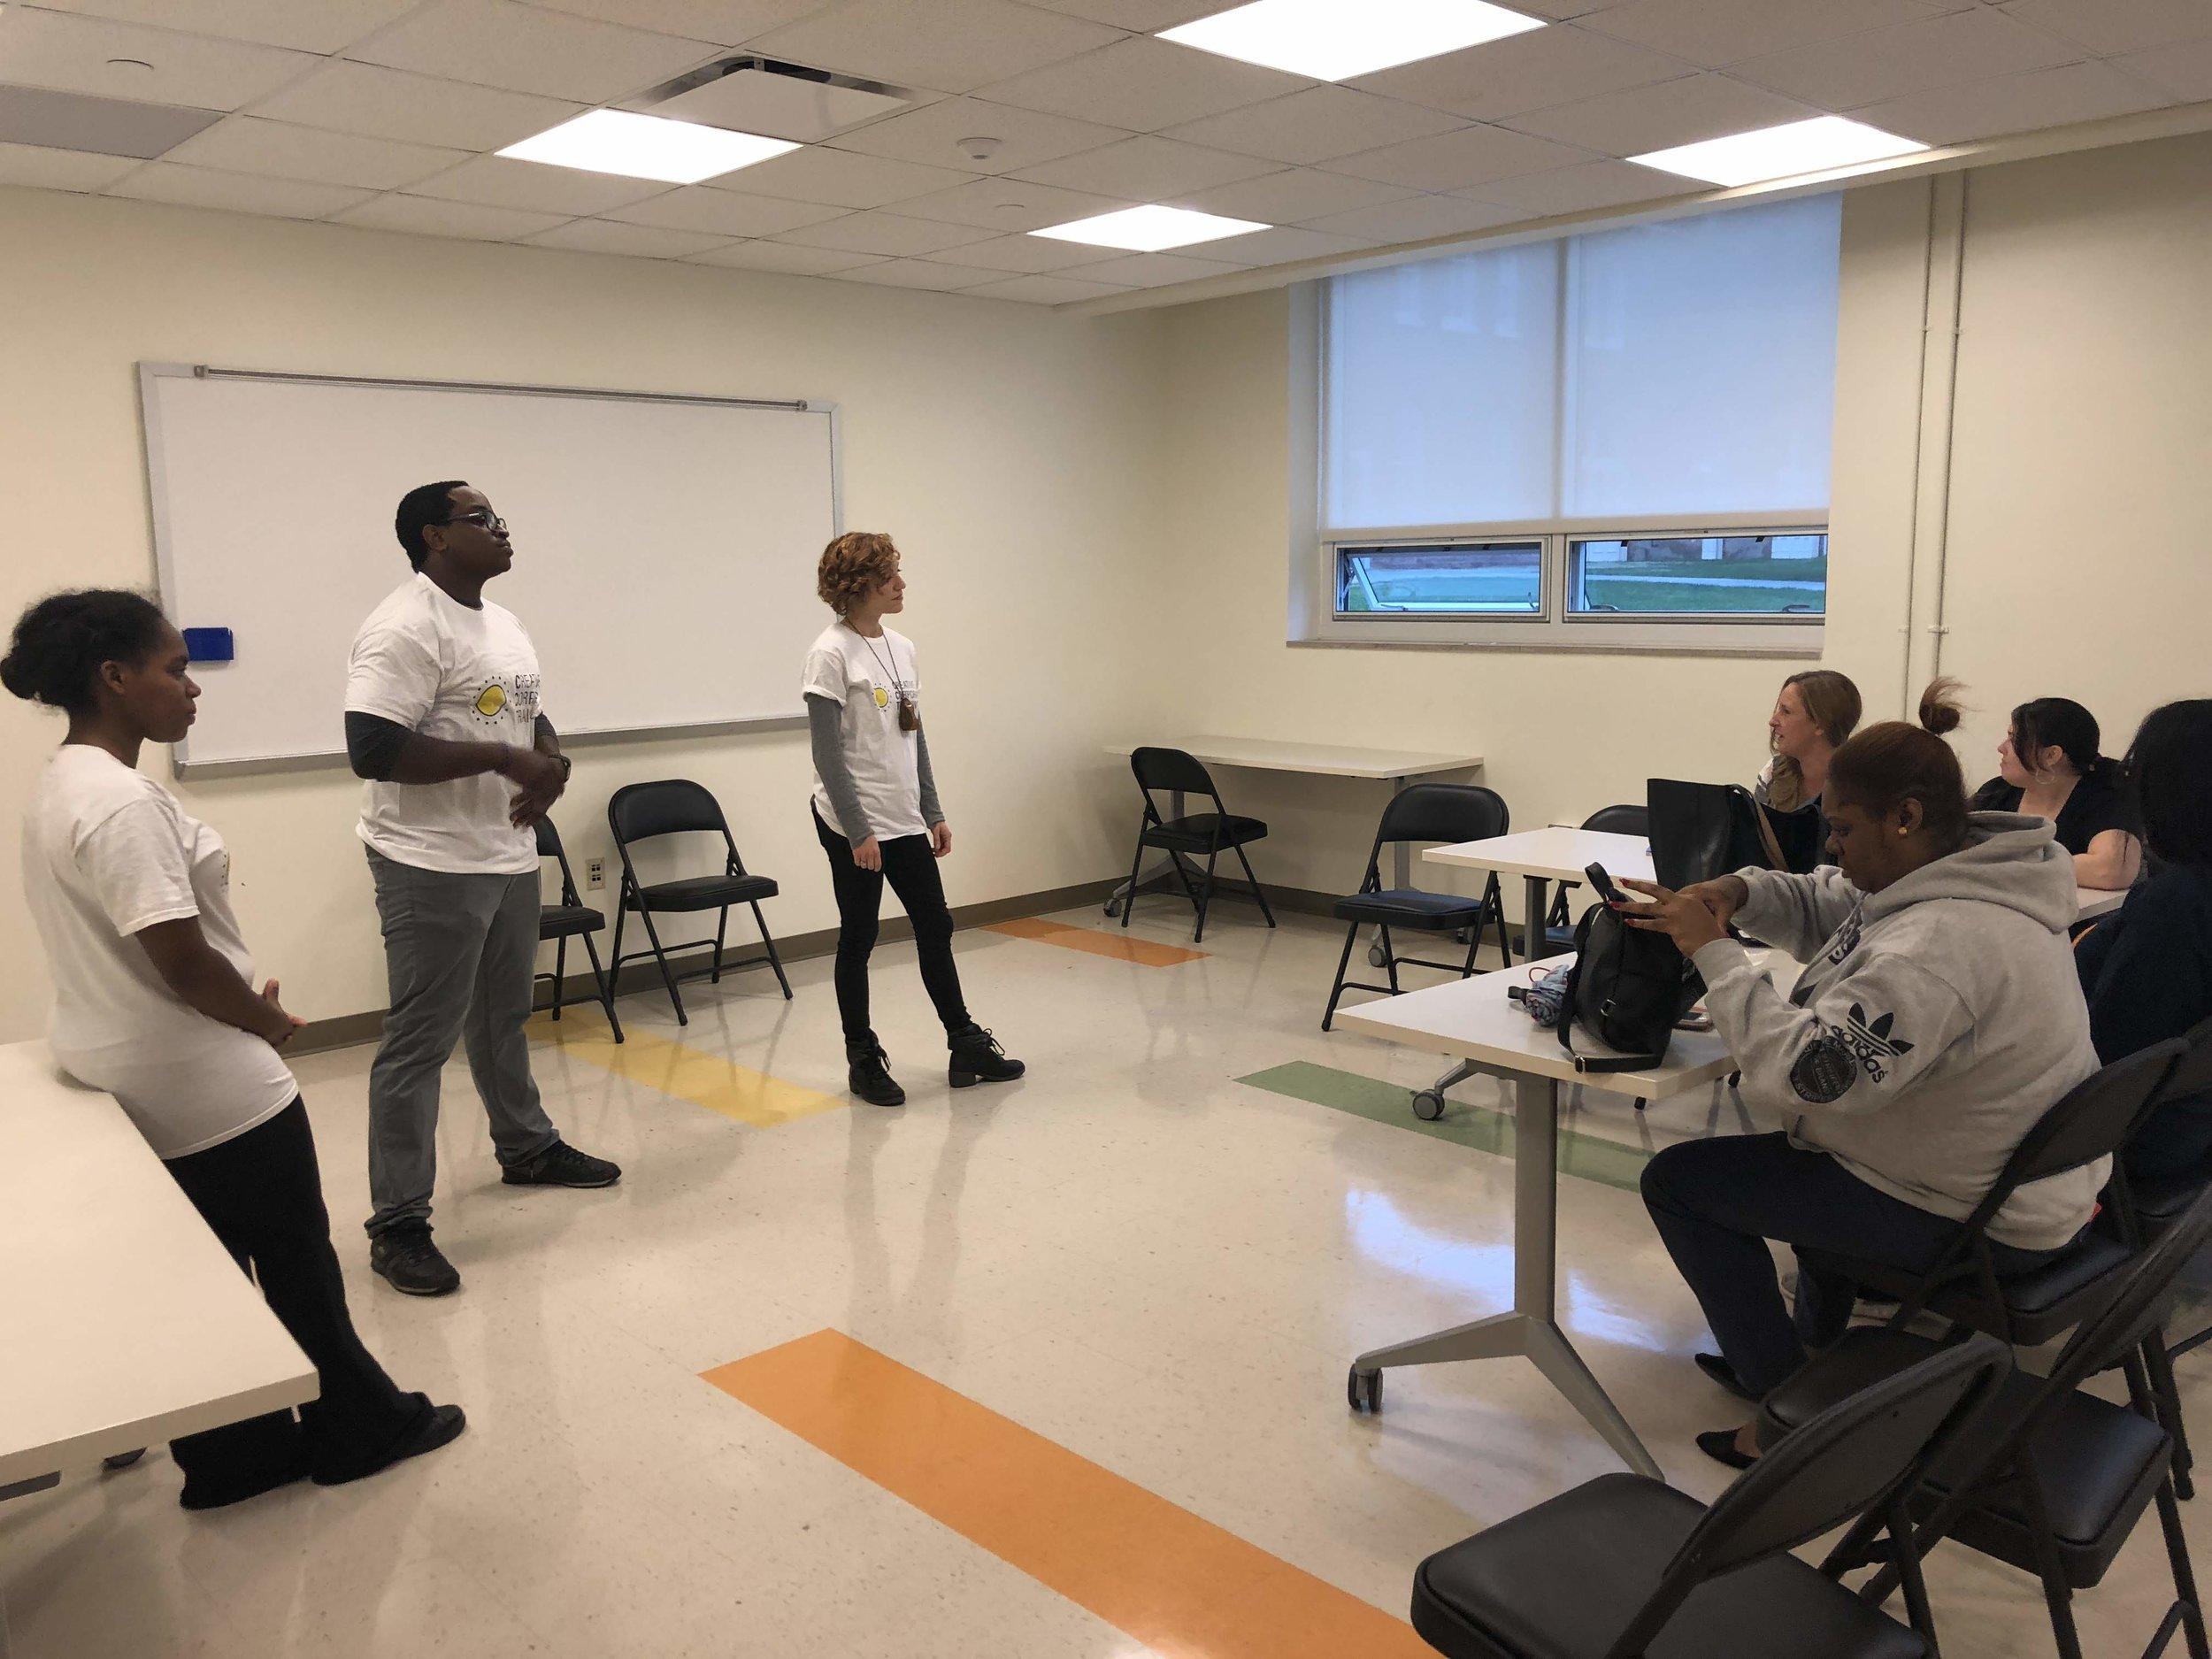 CCT staff Kiersten Adams, Eric Walker and facilitator Leah Holleran lead a workshop for the Drexel School of Medicine cohort, West Philadelphia Skills Initiative